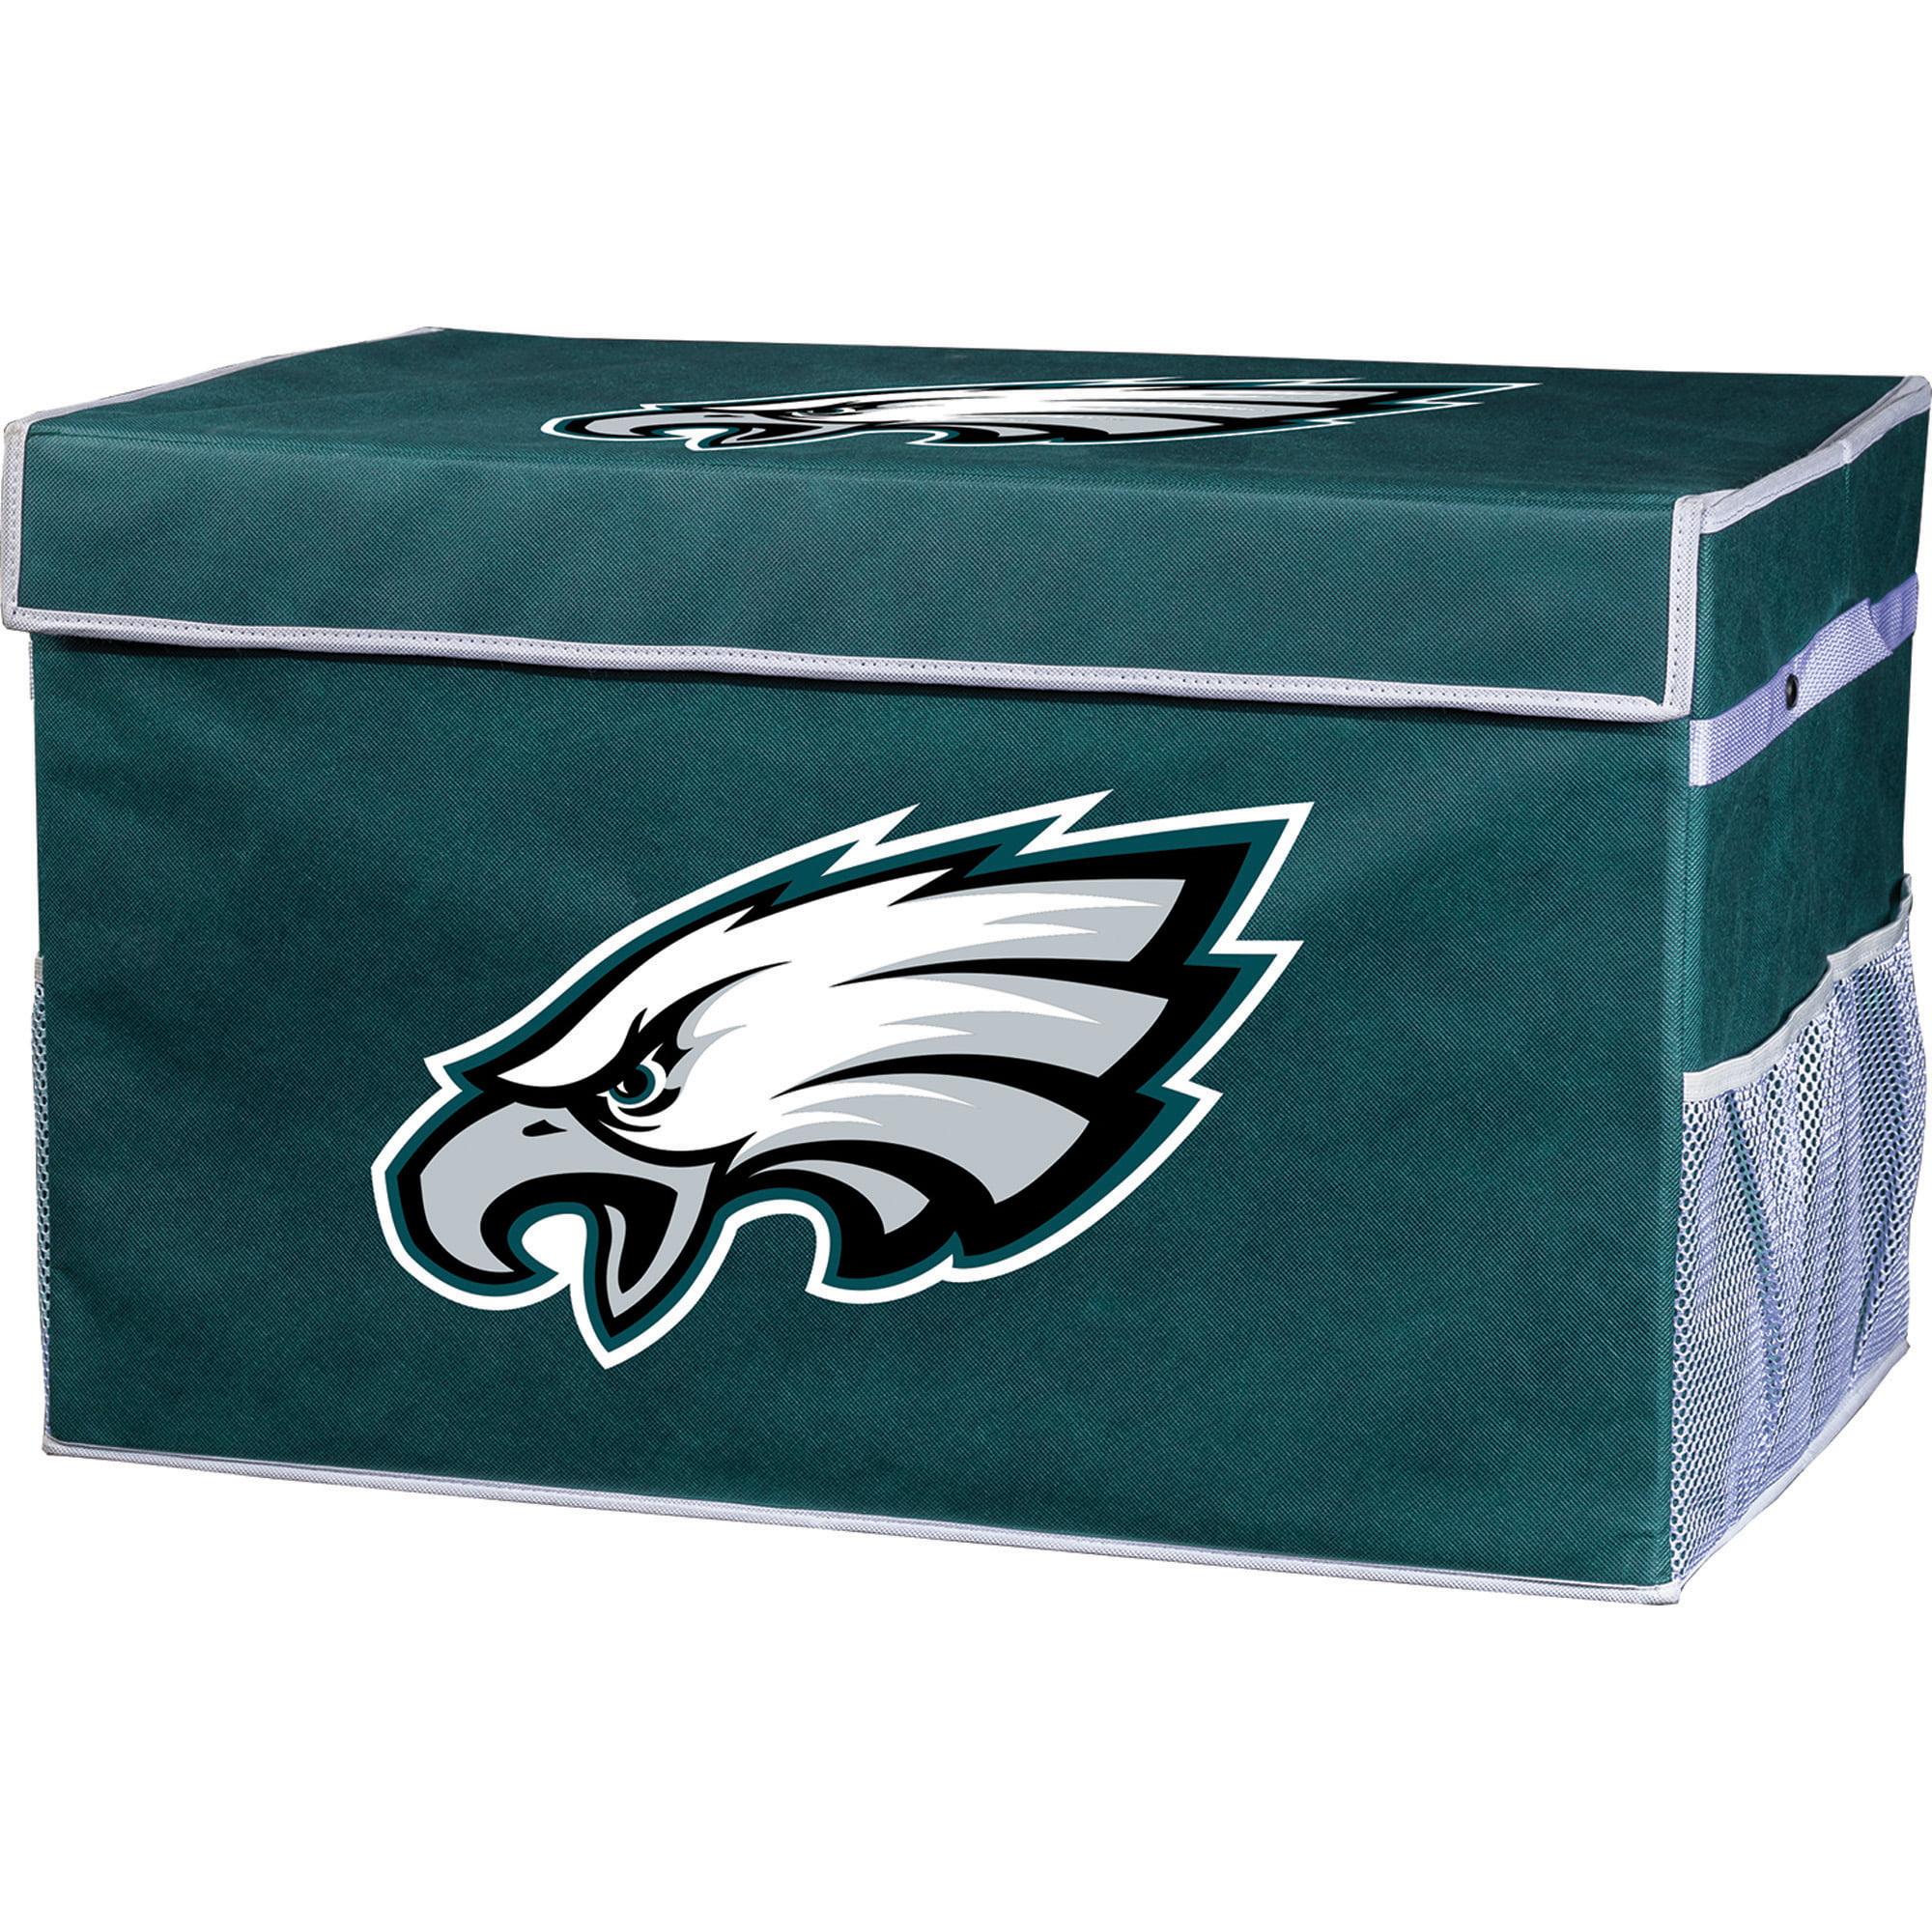 Franklin Sports NFL Philadelphia Eagles Collapsible Storage Footlocker Bins - Large